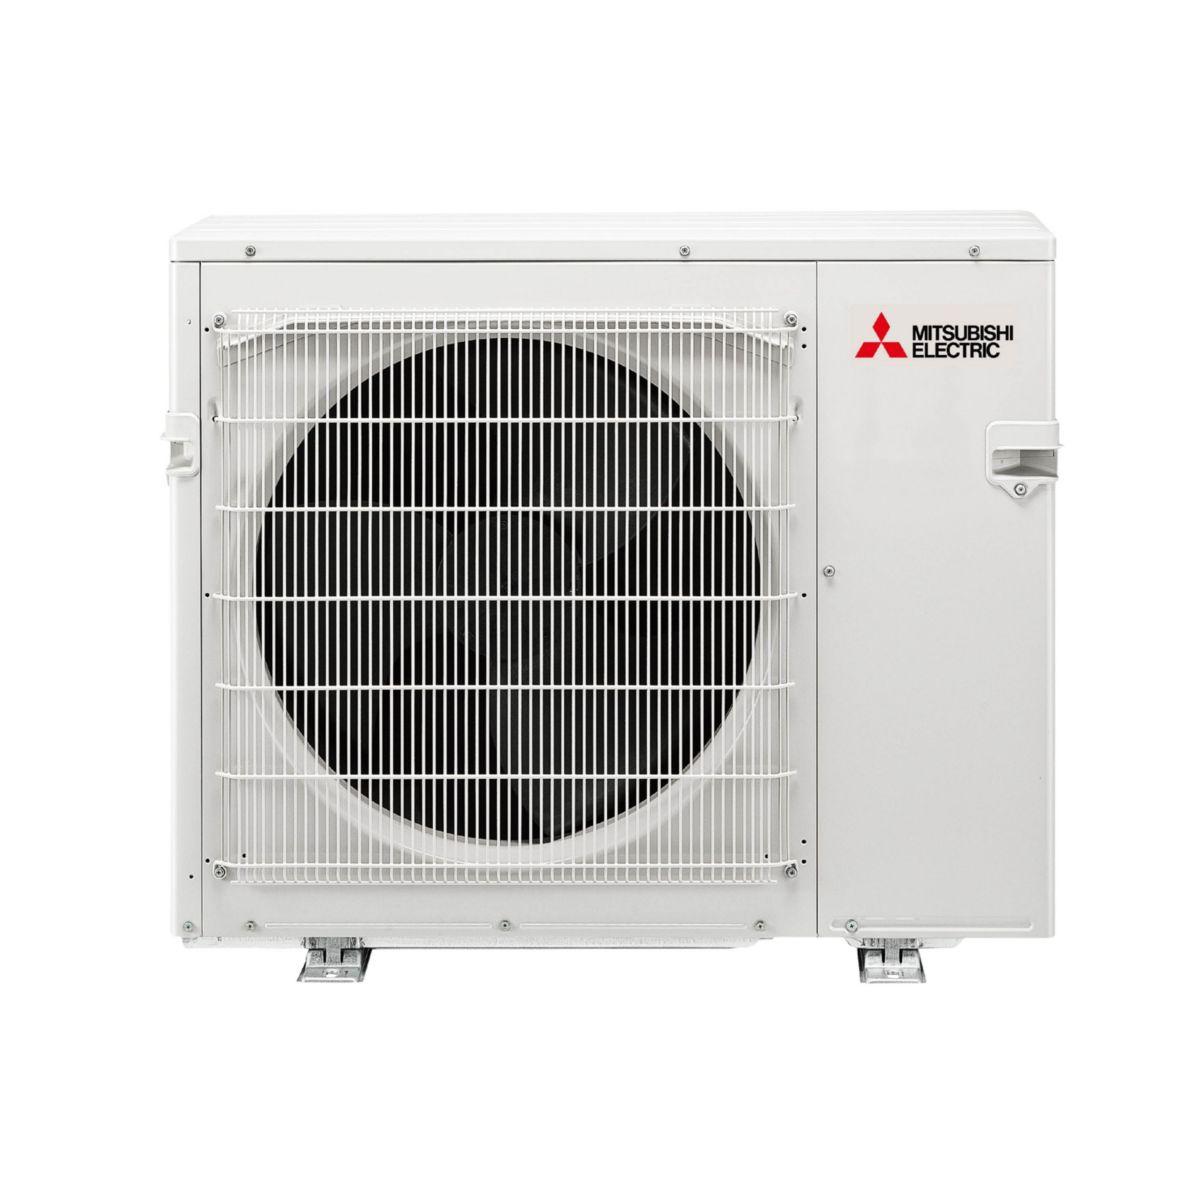 pakistan prices conditioners zone air split mitsubishi index heat pump in mxz